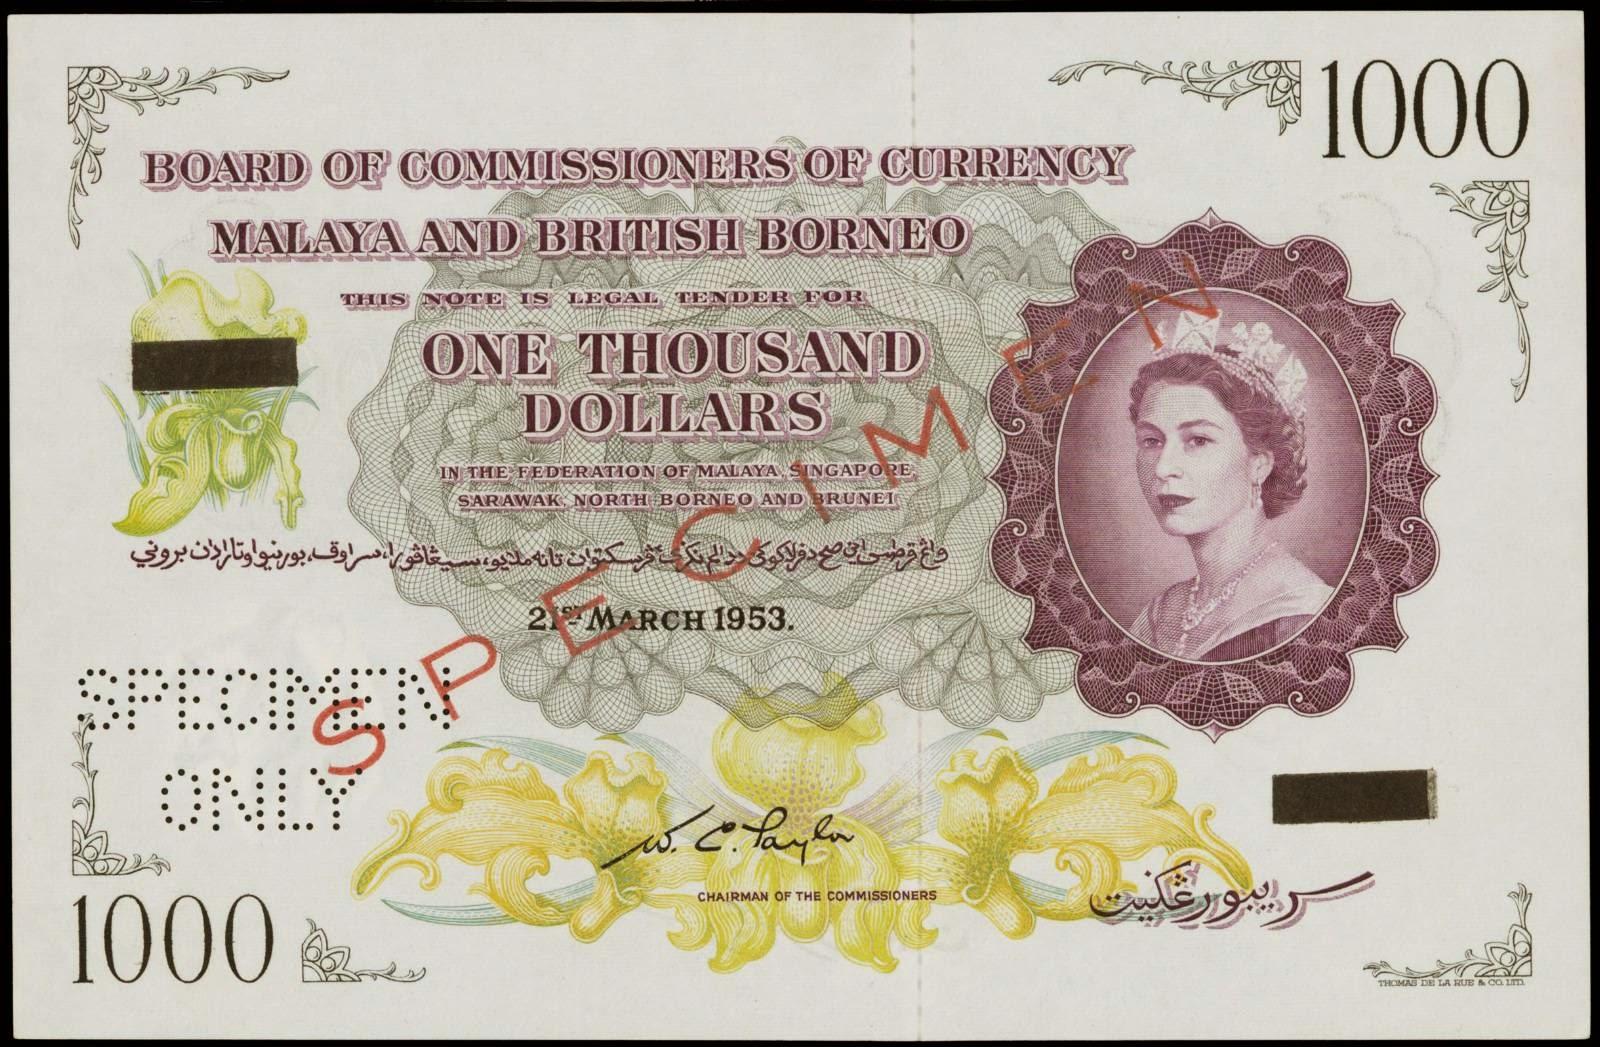 Malaya and British Borneo banknotes 1000 Dollars 1953 Queen Elizabeth II